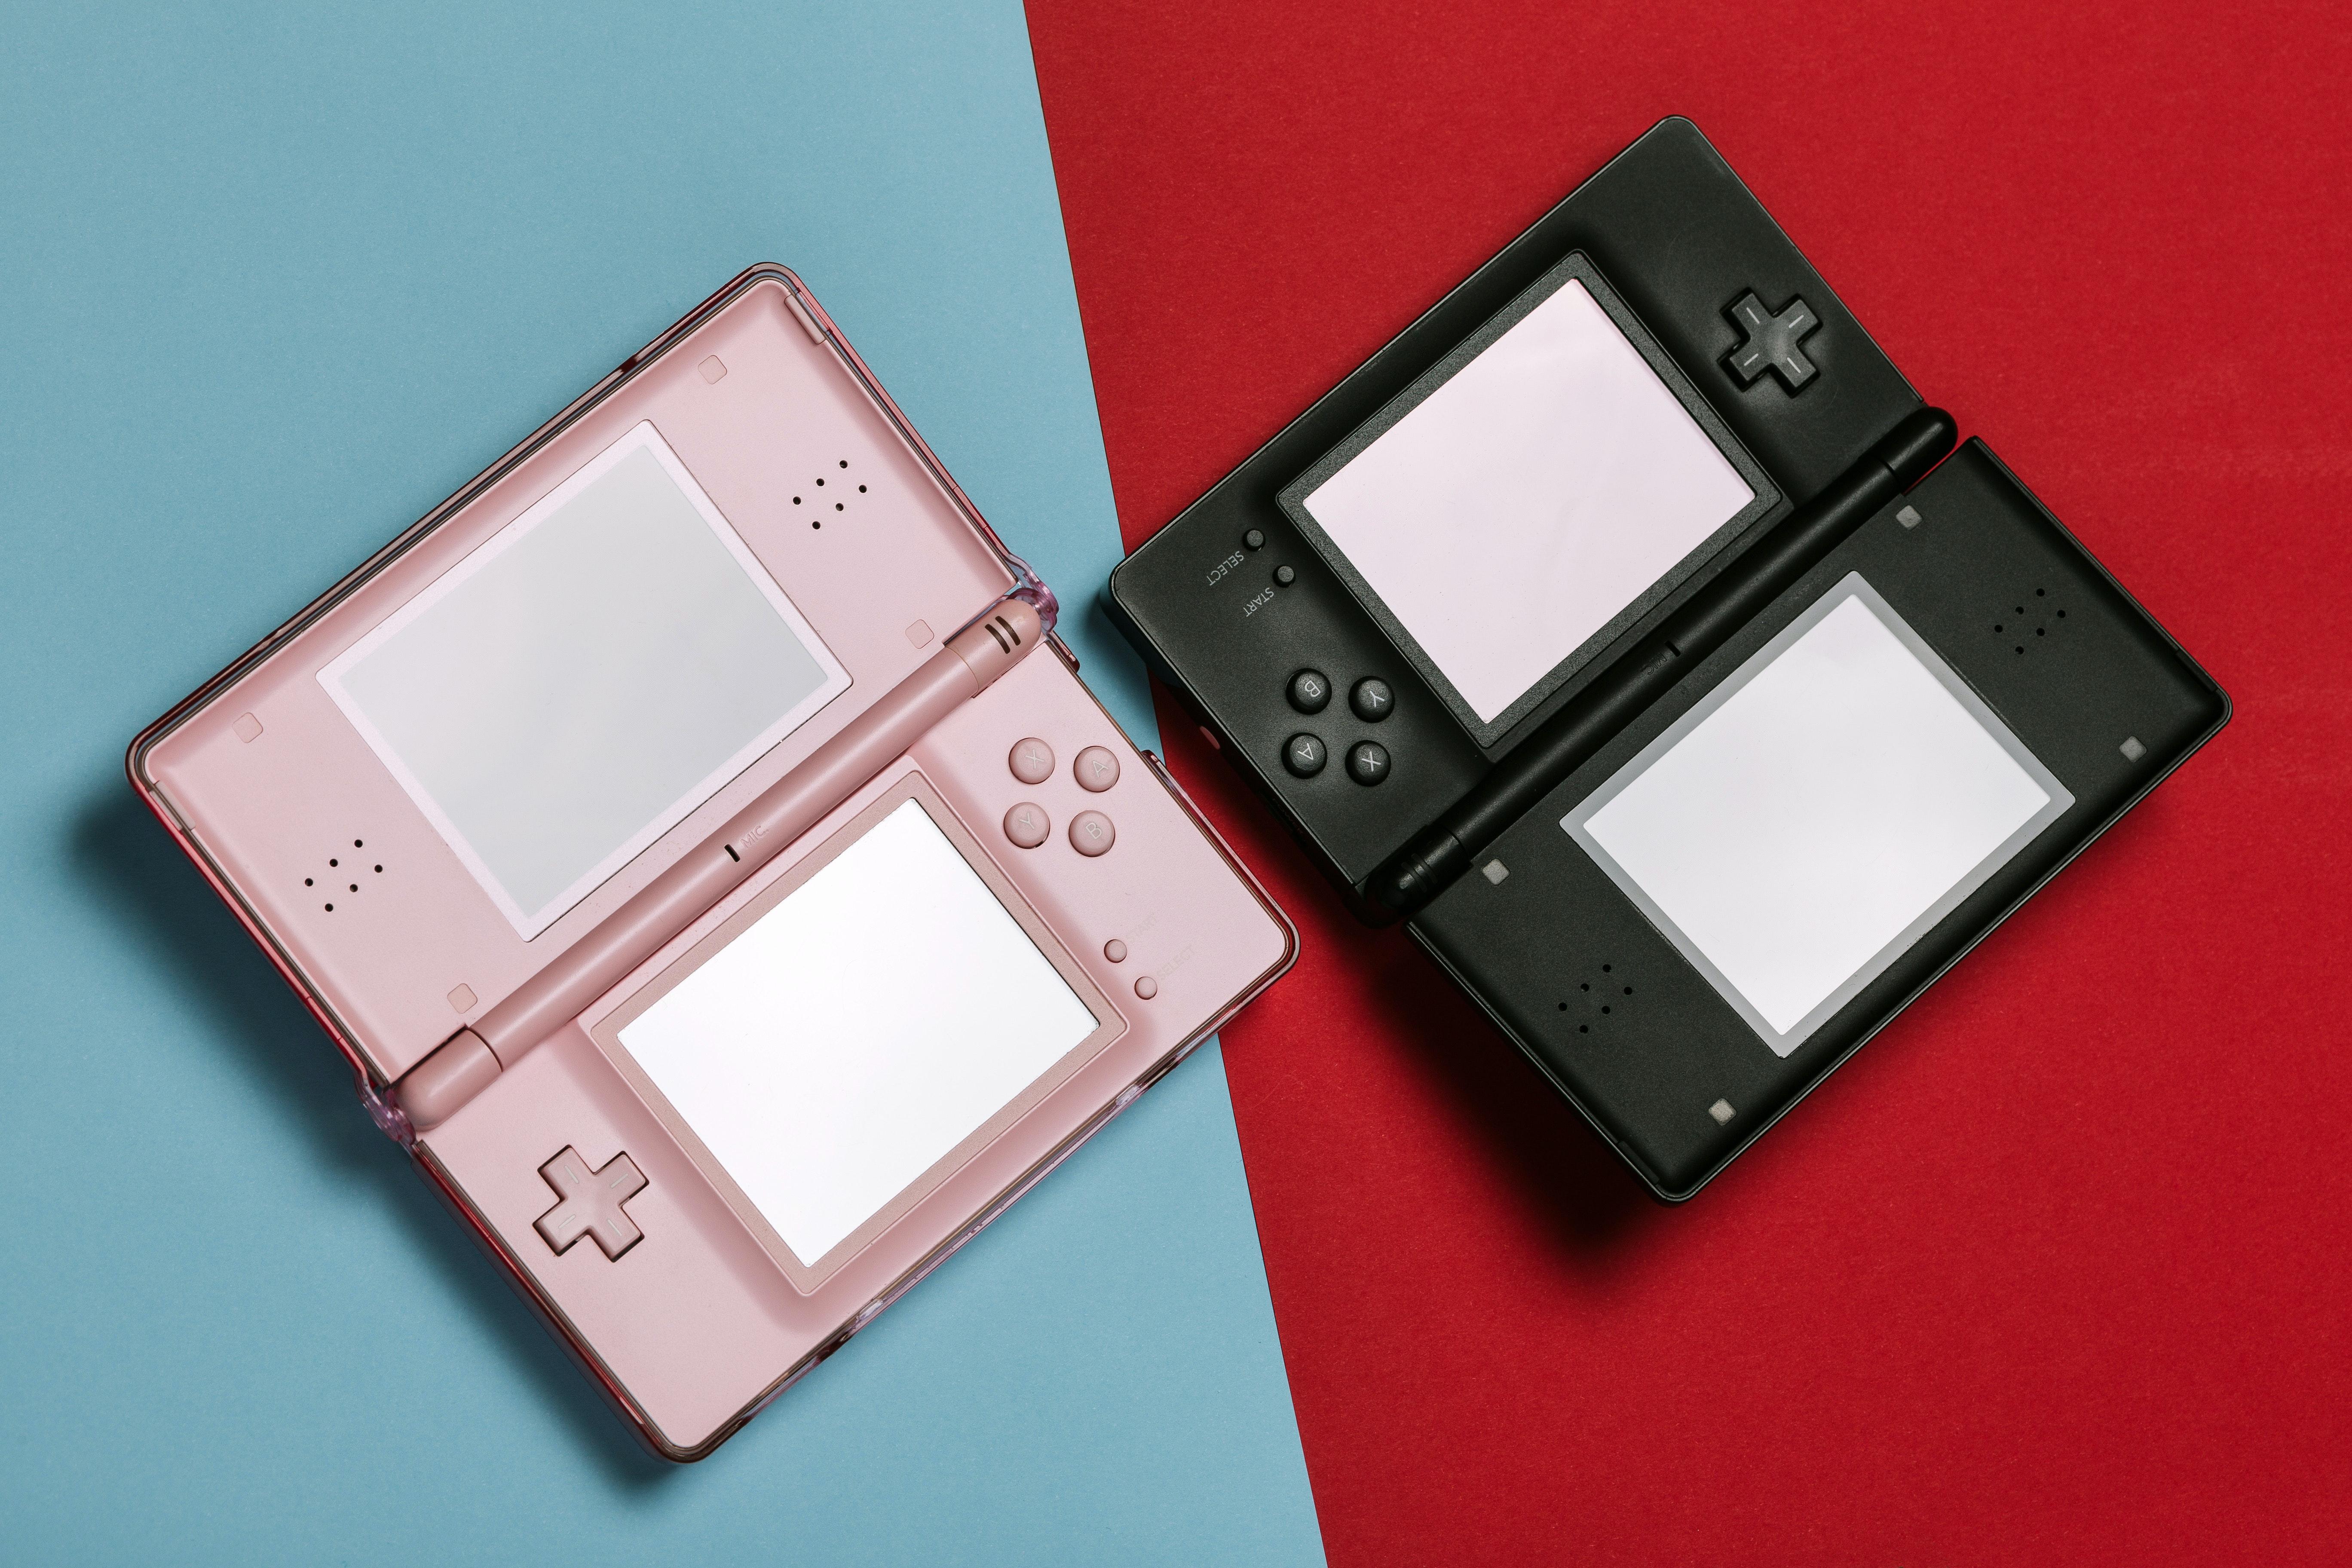 Blue Nintendo Game Boy with dual screen